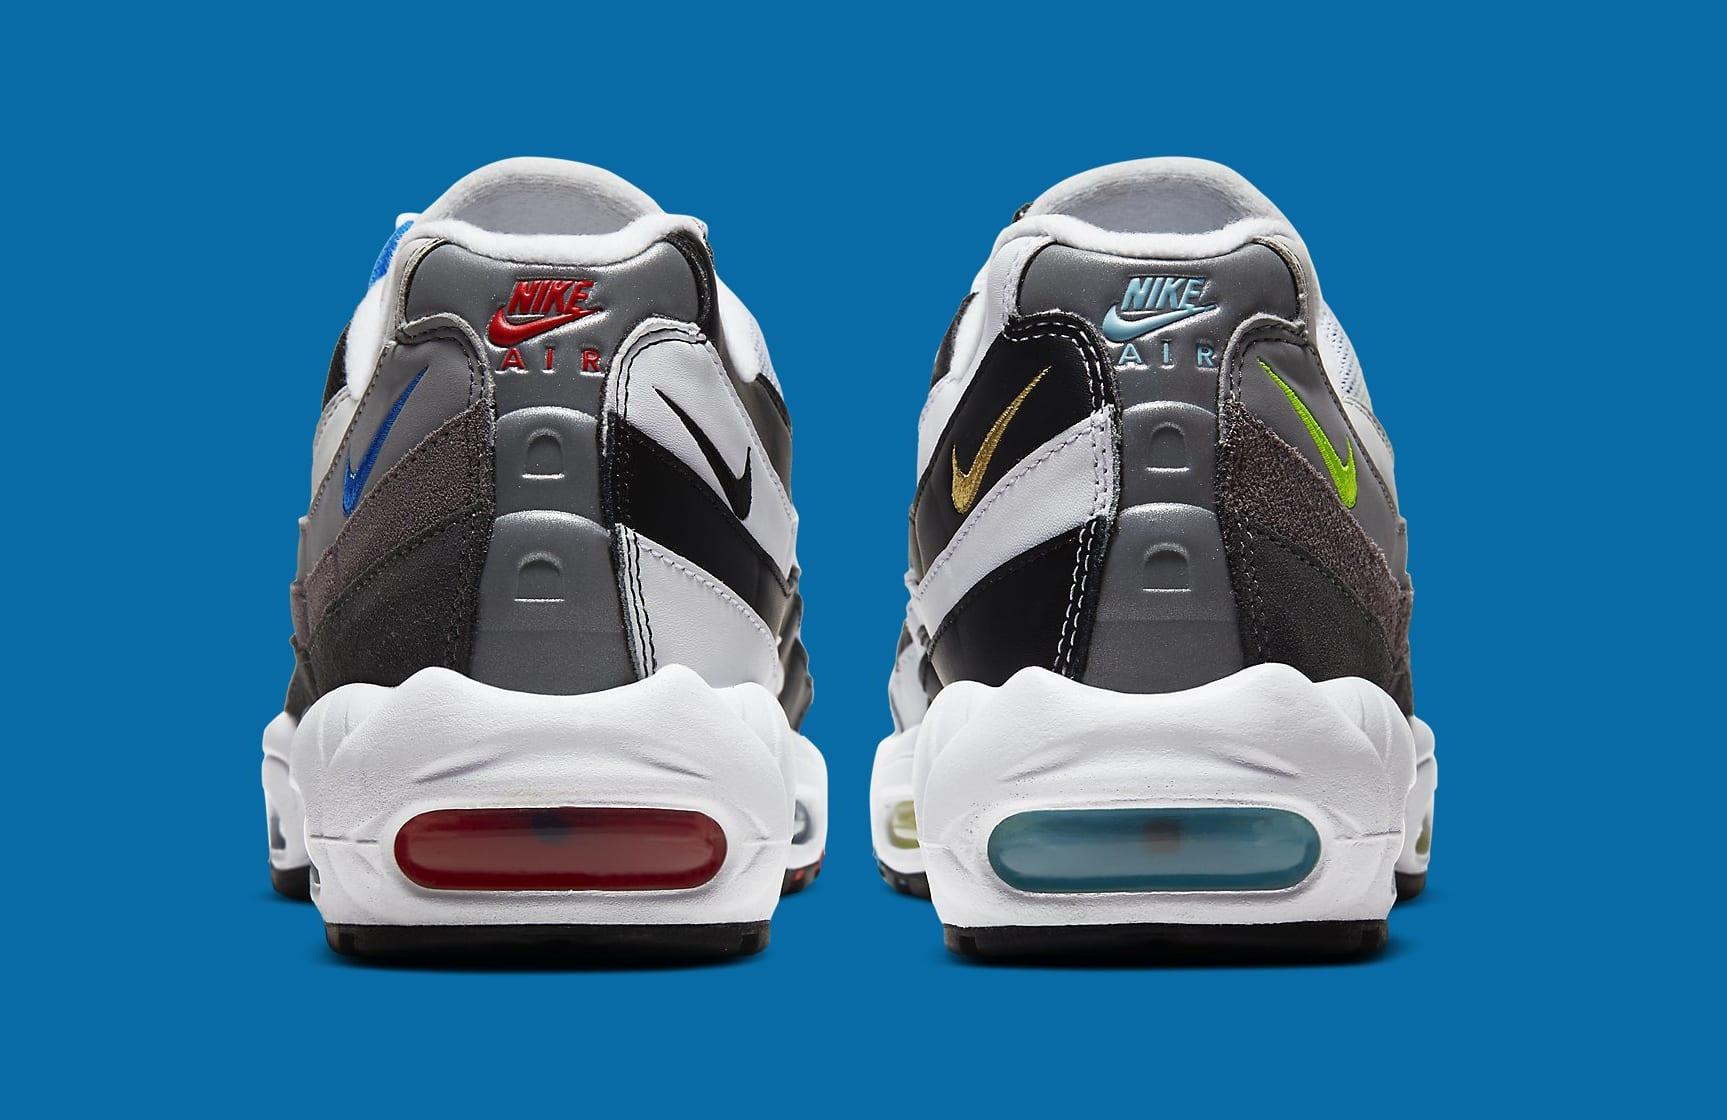 Nike Air Max 95 'Greedy 2.0' CJ0589-001 Heel